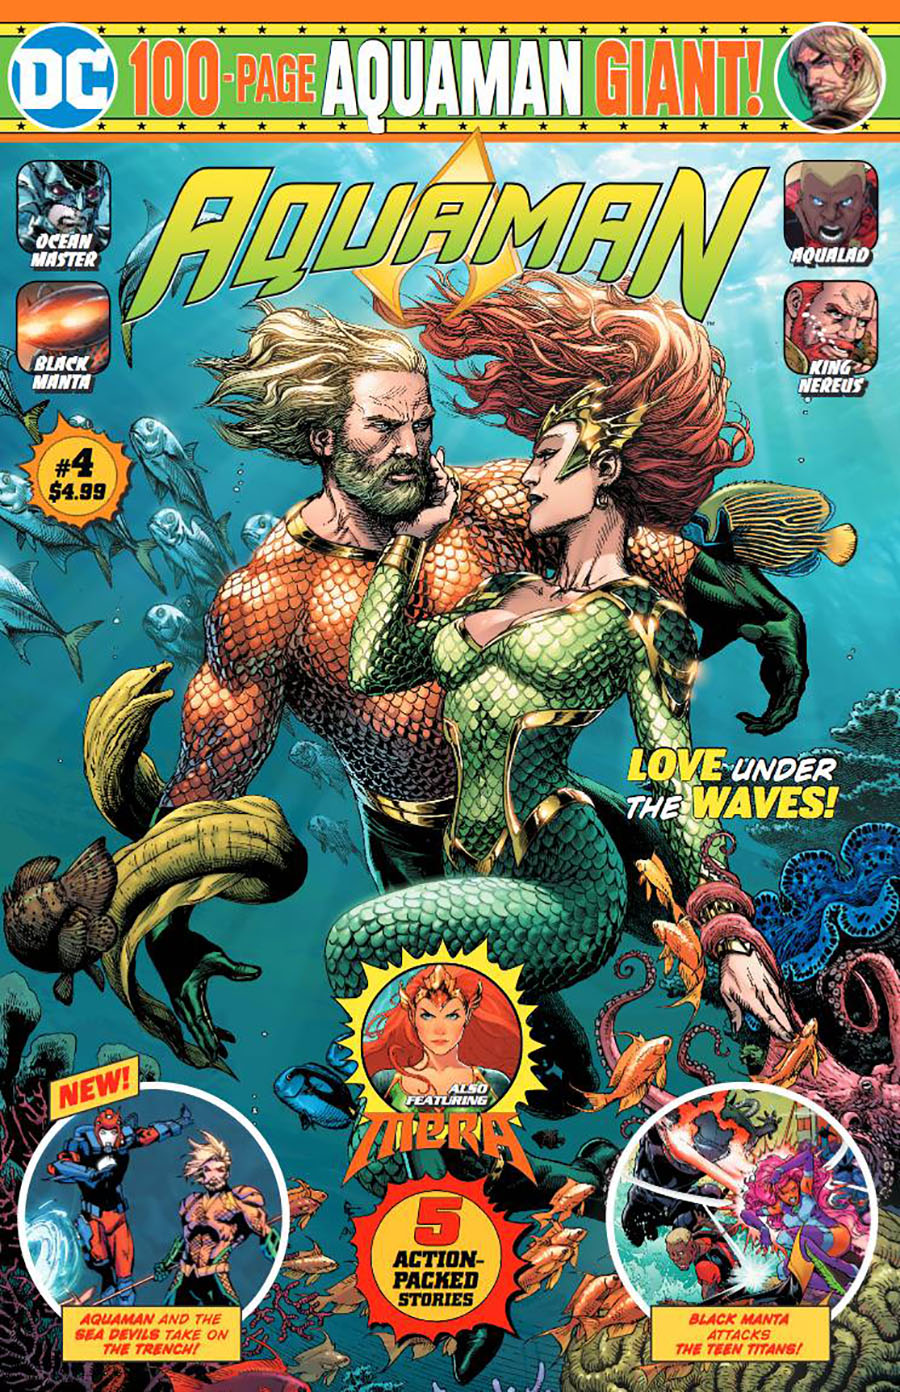 Aquaman 100-Page Giant (Walmart) #4 (2020)